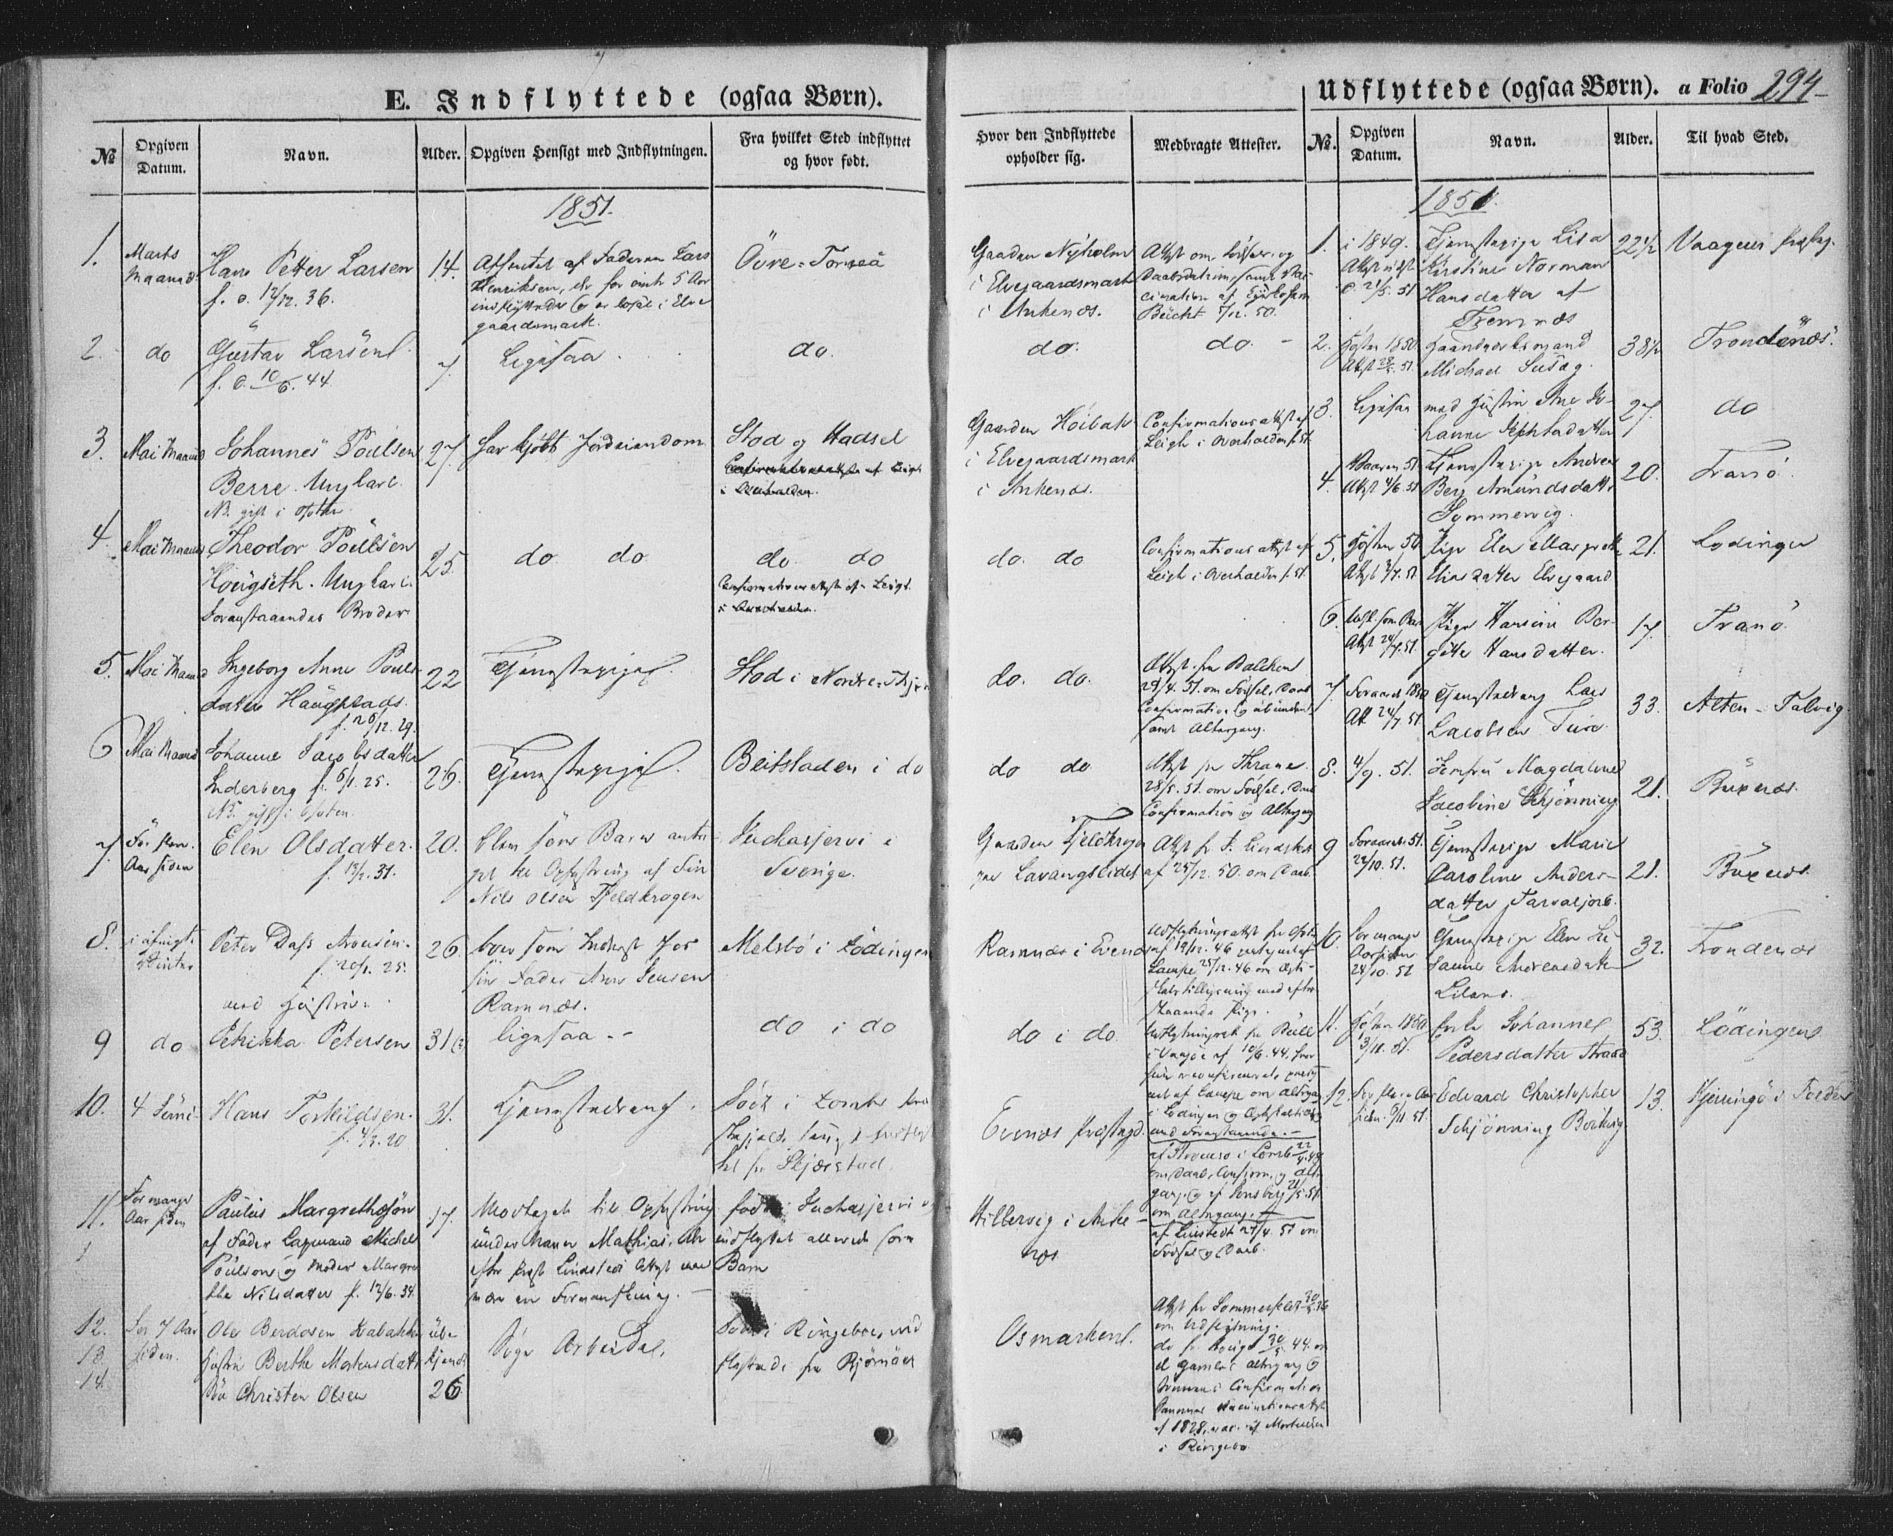 SAT, Ministerialprotokoller, klokkerbøker og fødselsregistre - Nordland, 863/L0895: Ministerialbok nr. 863A07, 1851-1860, s. 294